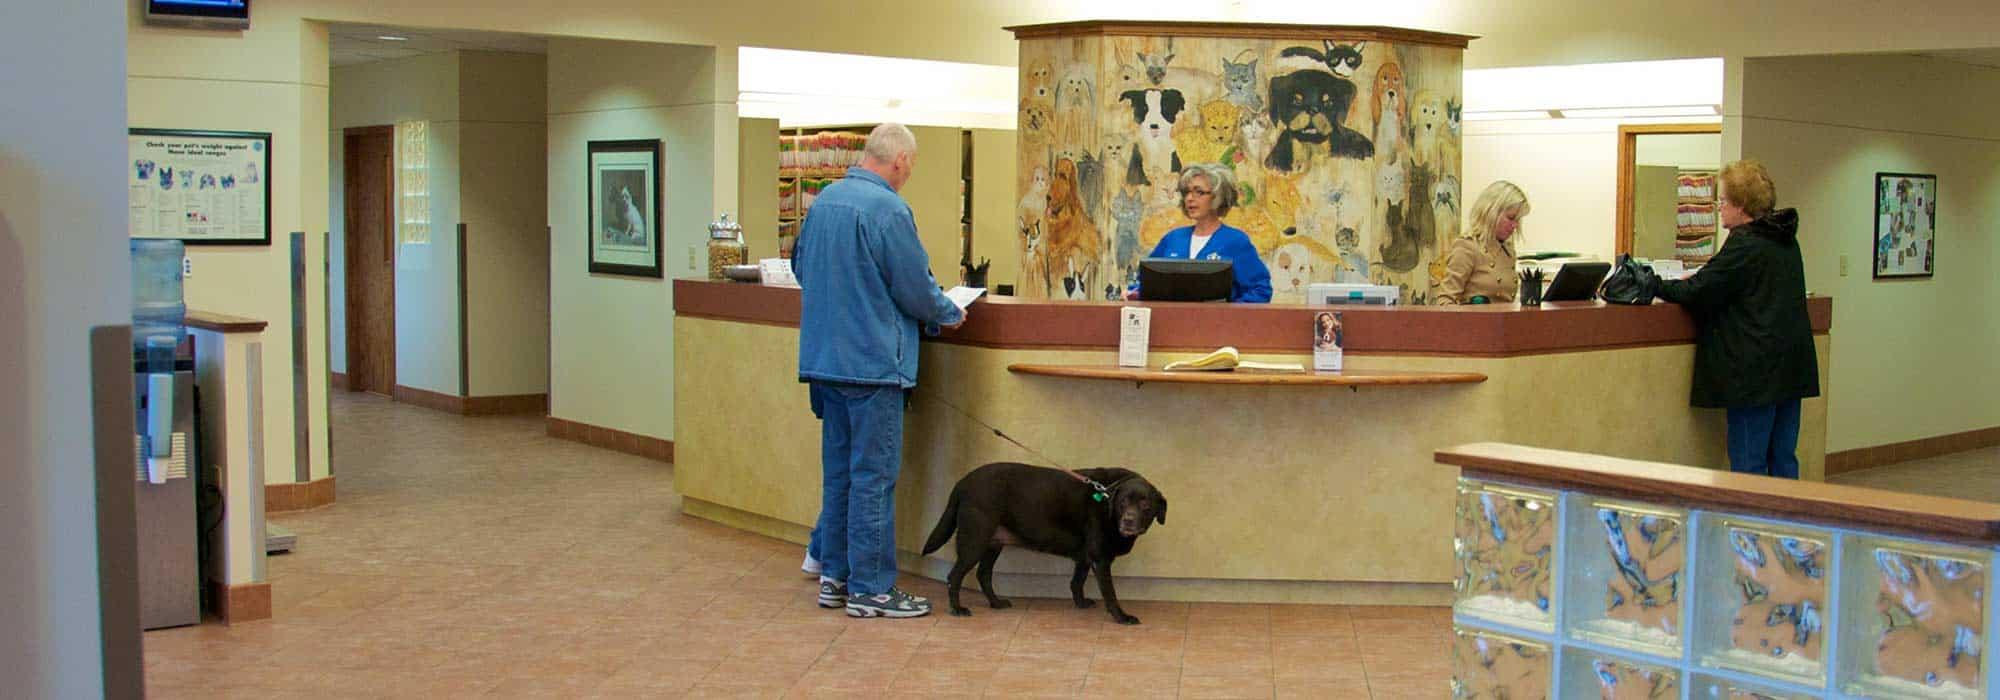 Pet Care Articles in Cincinnati OH